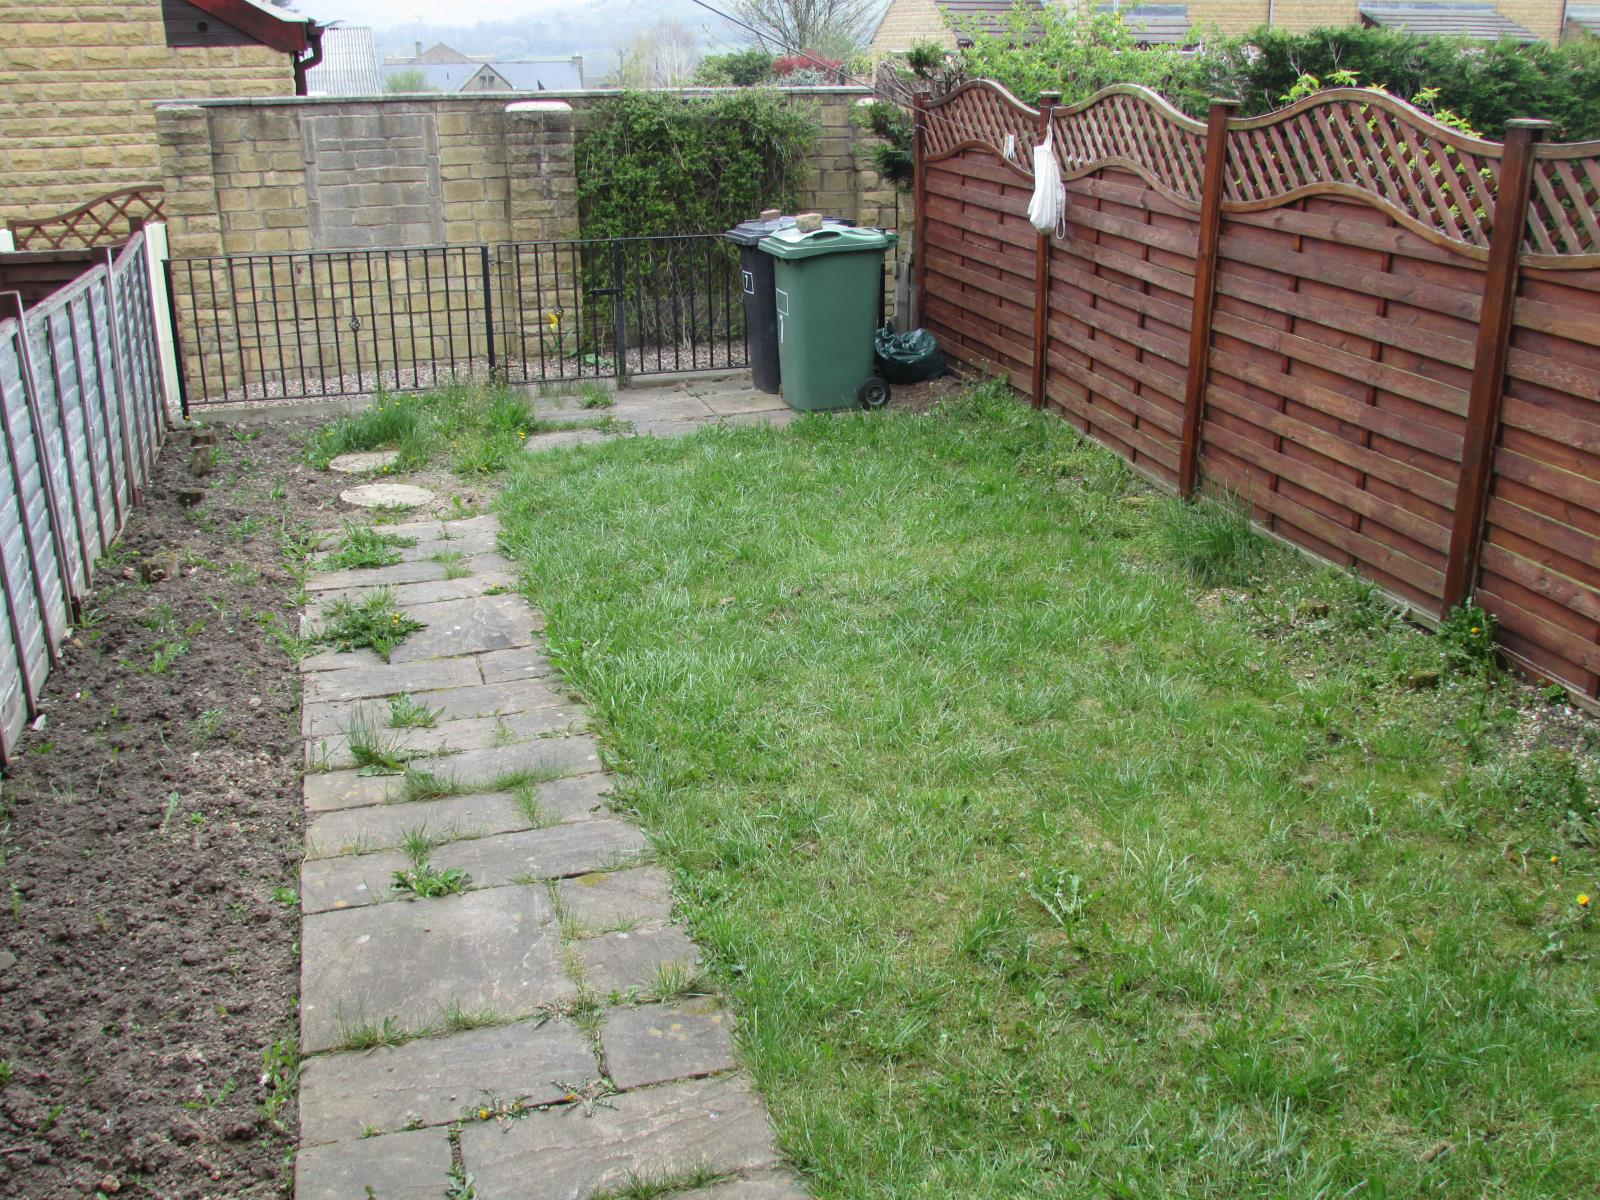 7 Grassmoor Fold, Honley, HD9 6DL